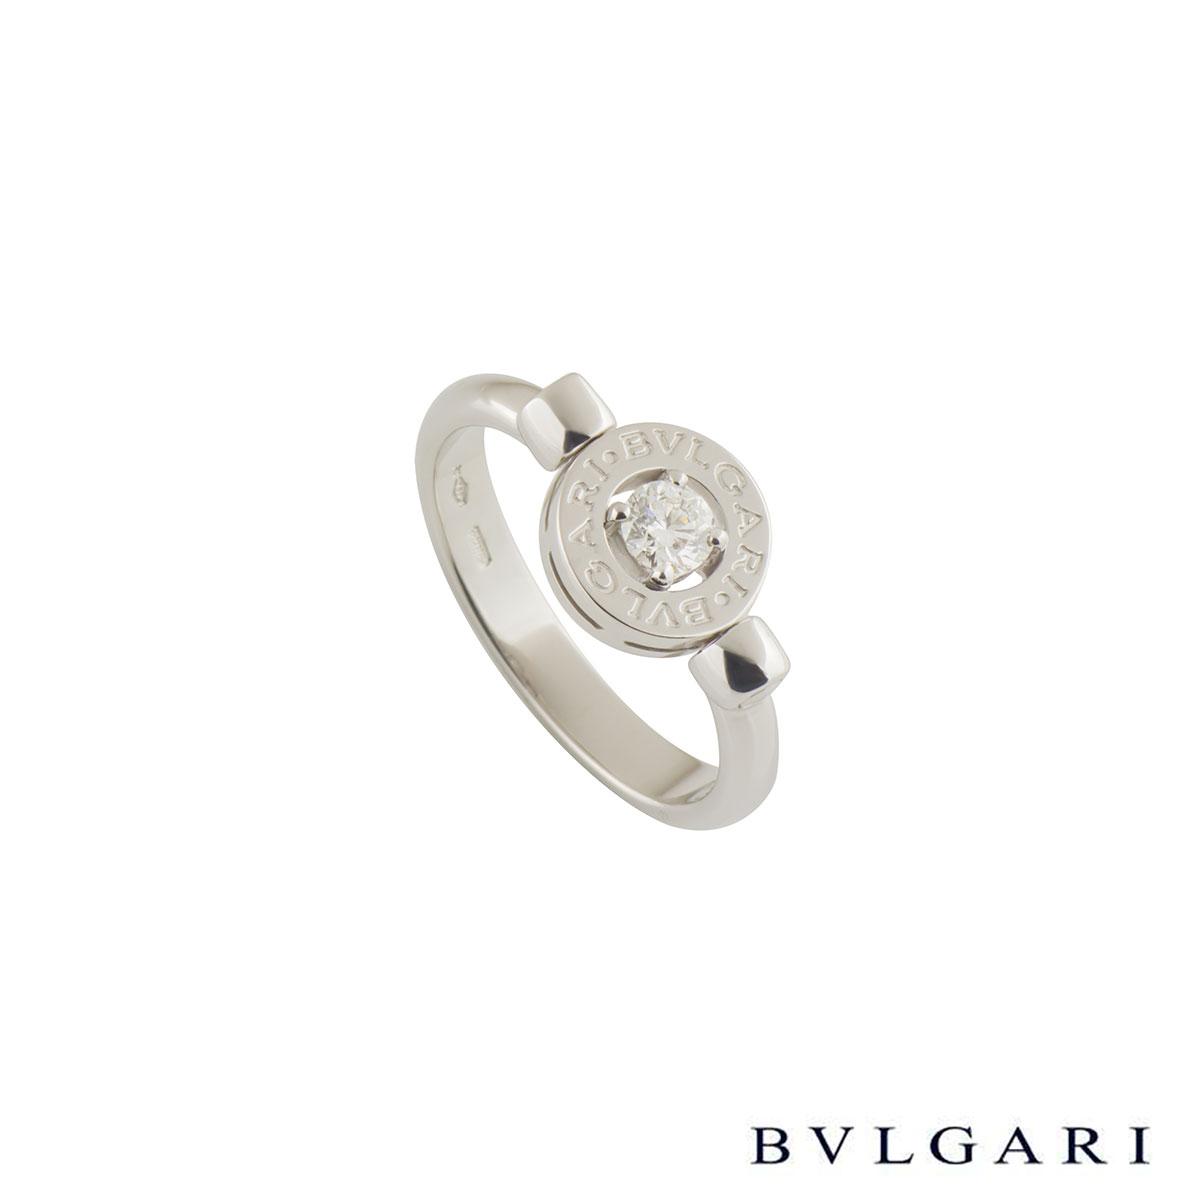 Bvlgari Bvlgari White Gold Diamond Ring AN856302